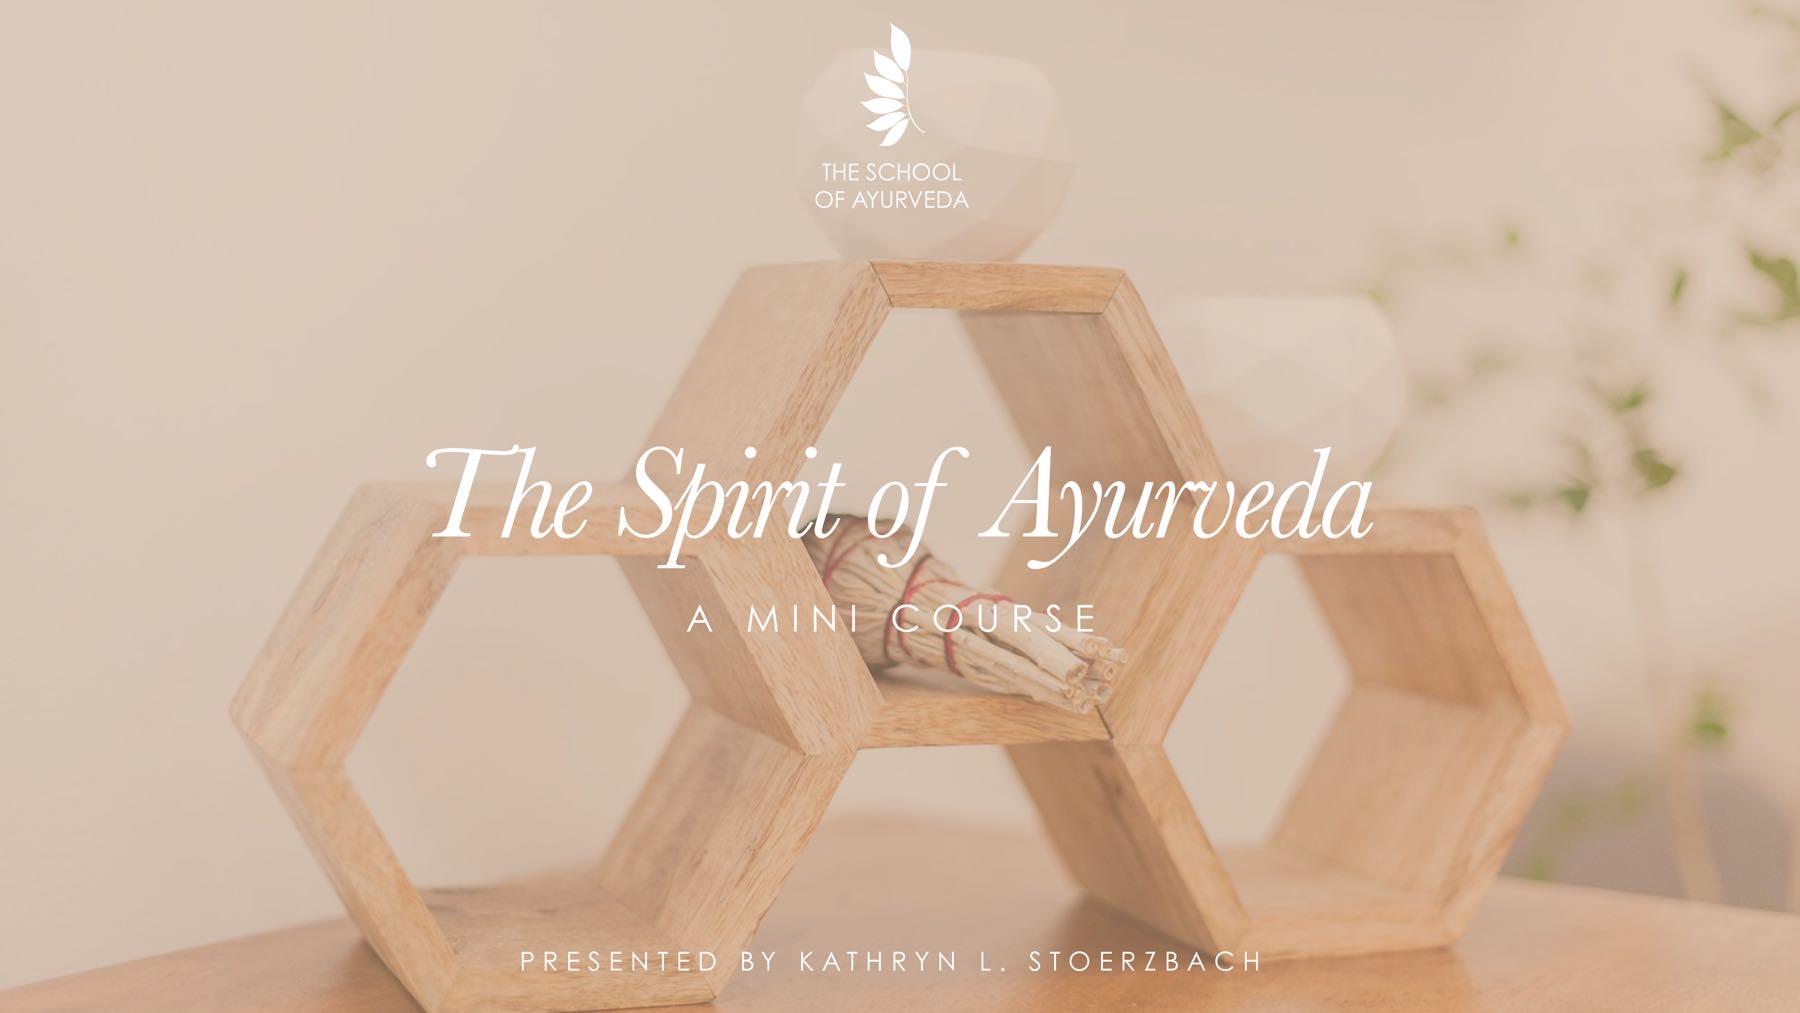 The Spirit of Ayurveda, mini course.